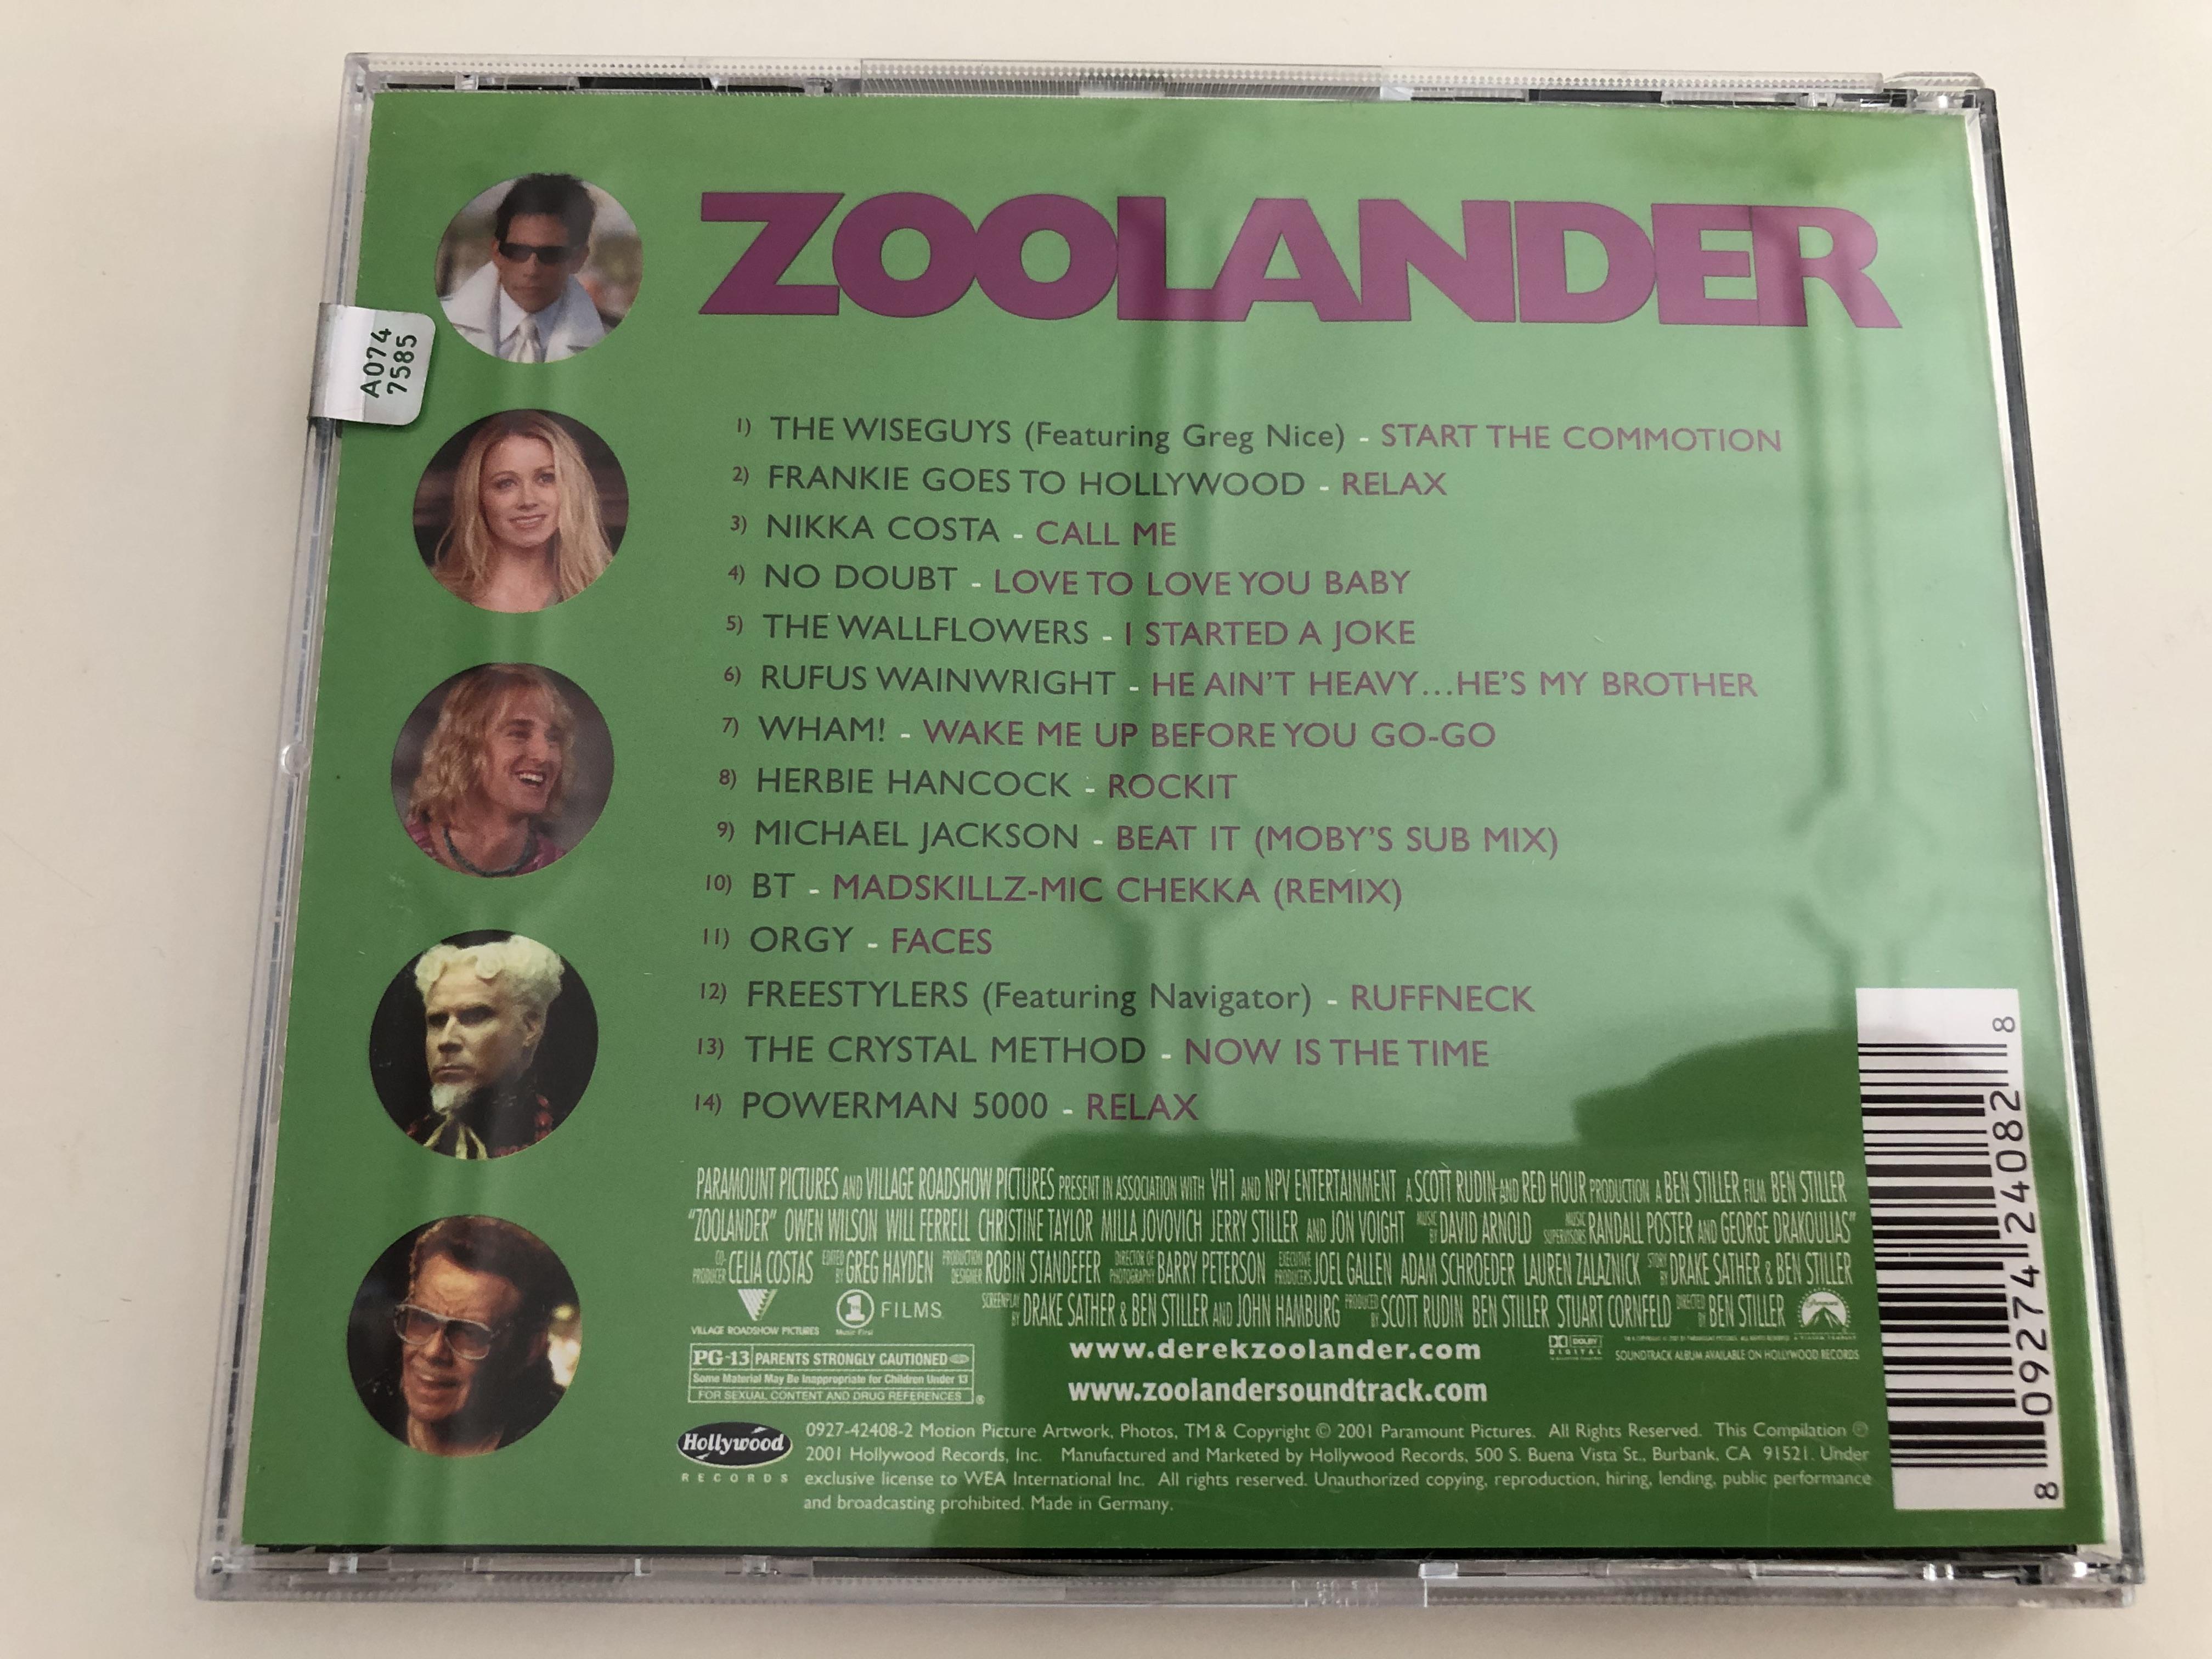 ben-stiller-zoolander-music-from-the-motion-picture-audio-cd-2001-2-.jpg